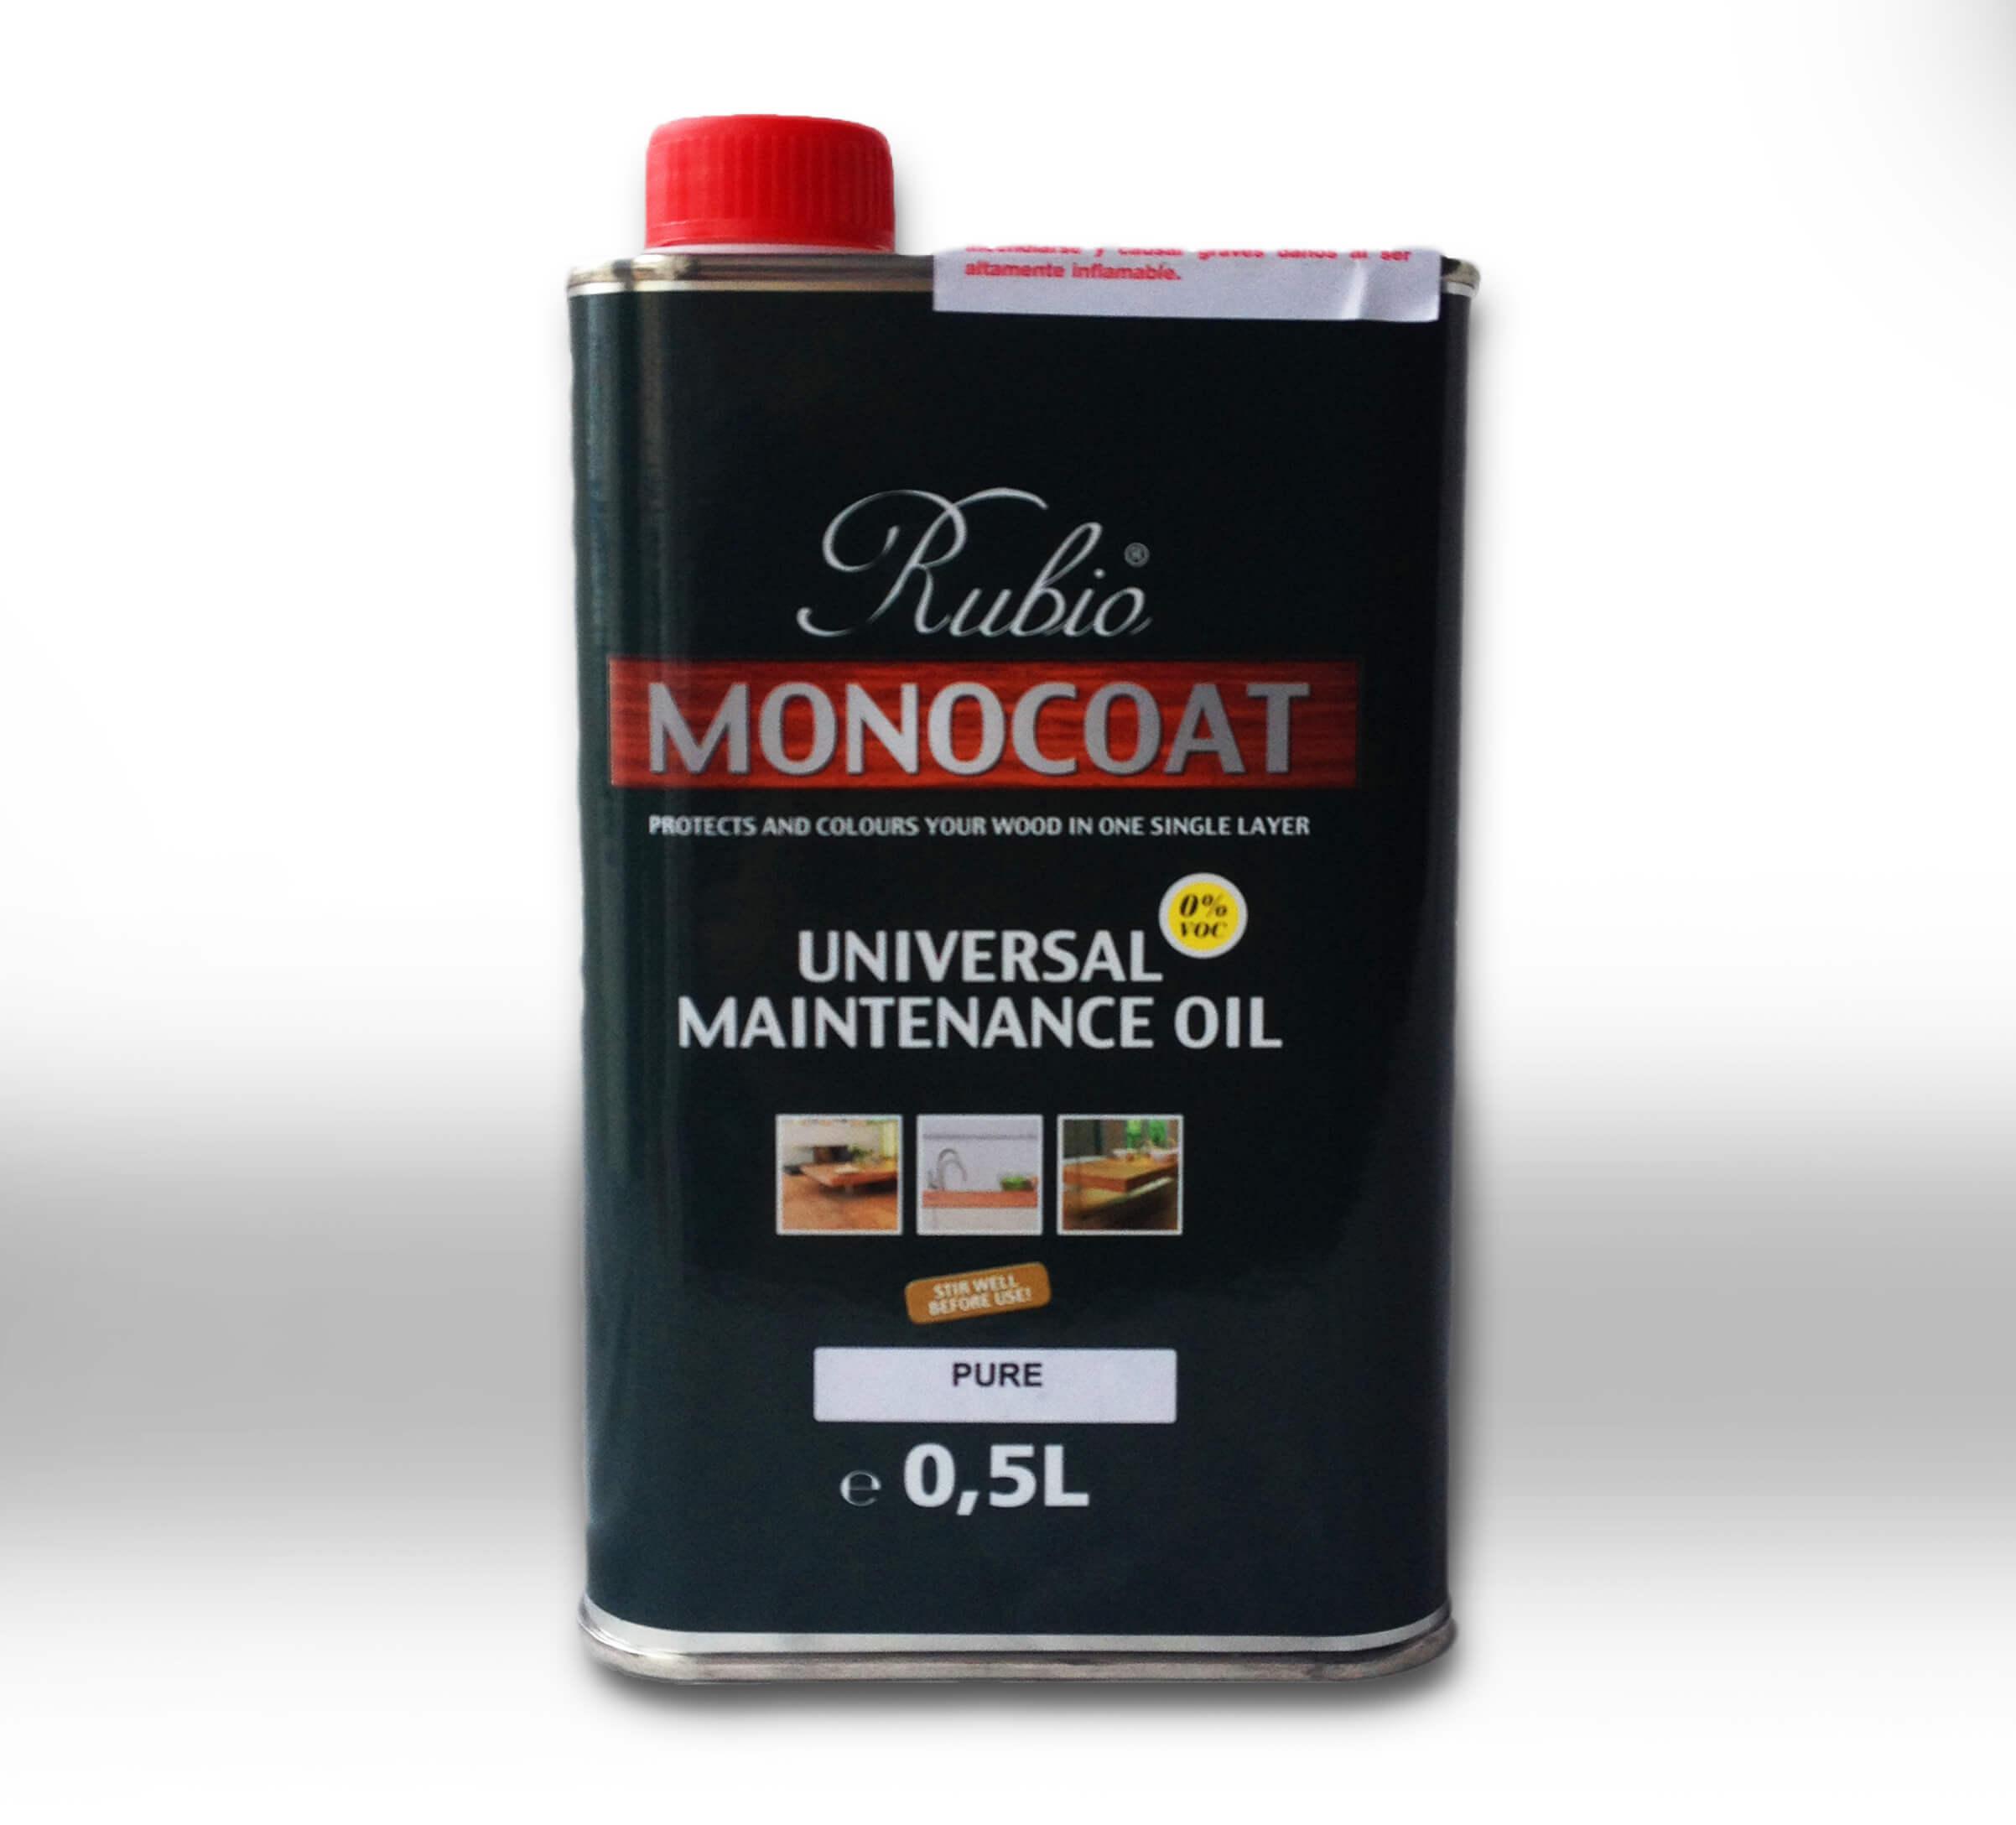 Rubio Monocoat Maintenance Oil